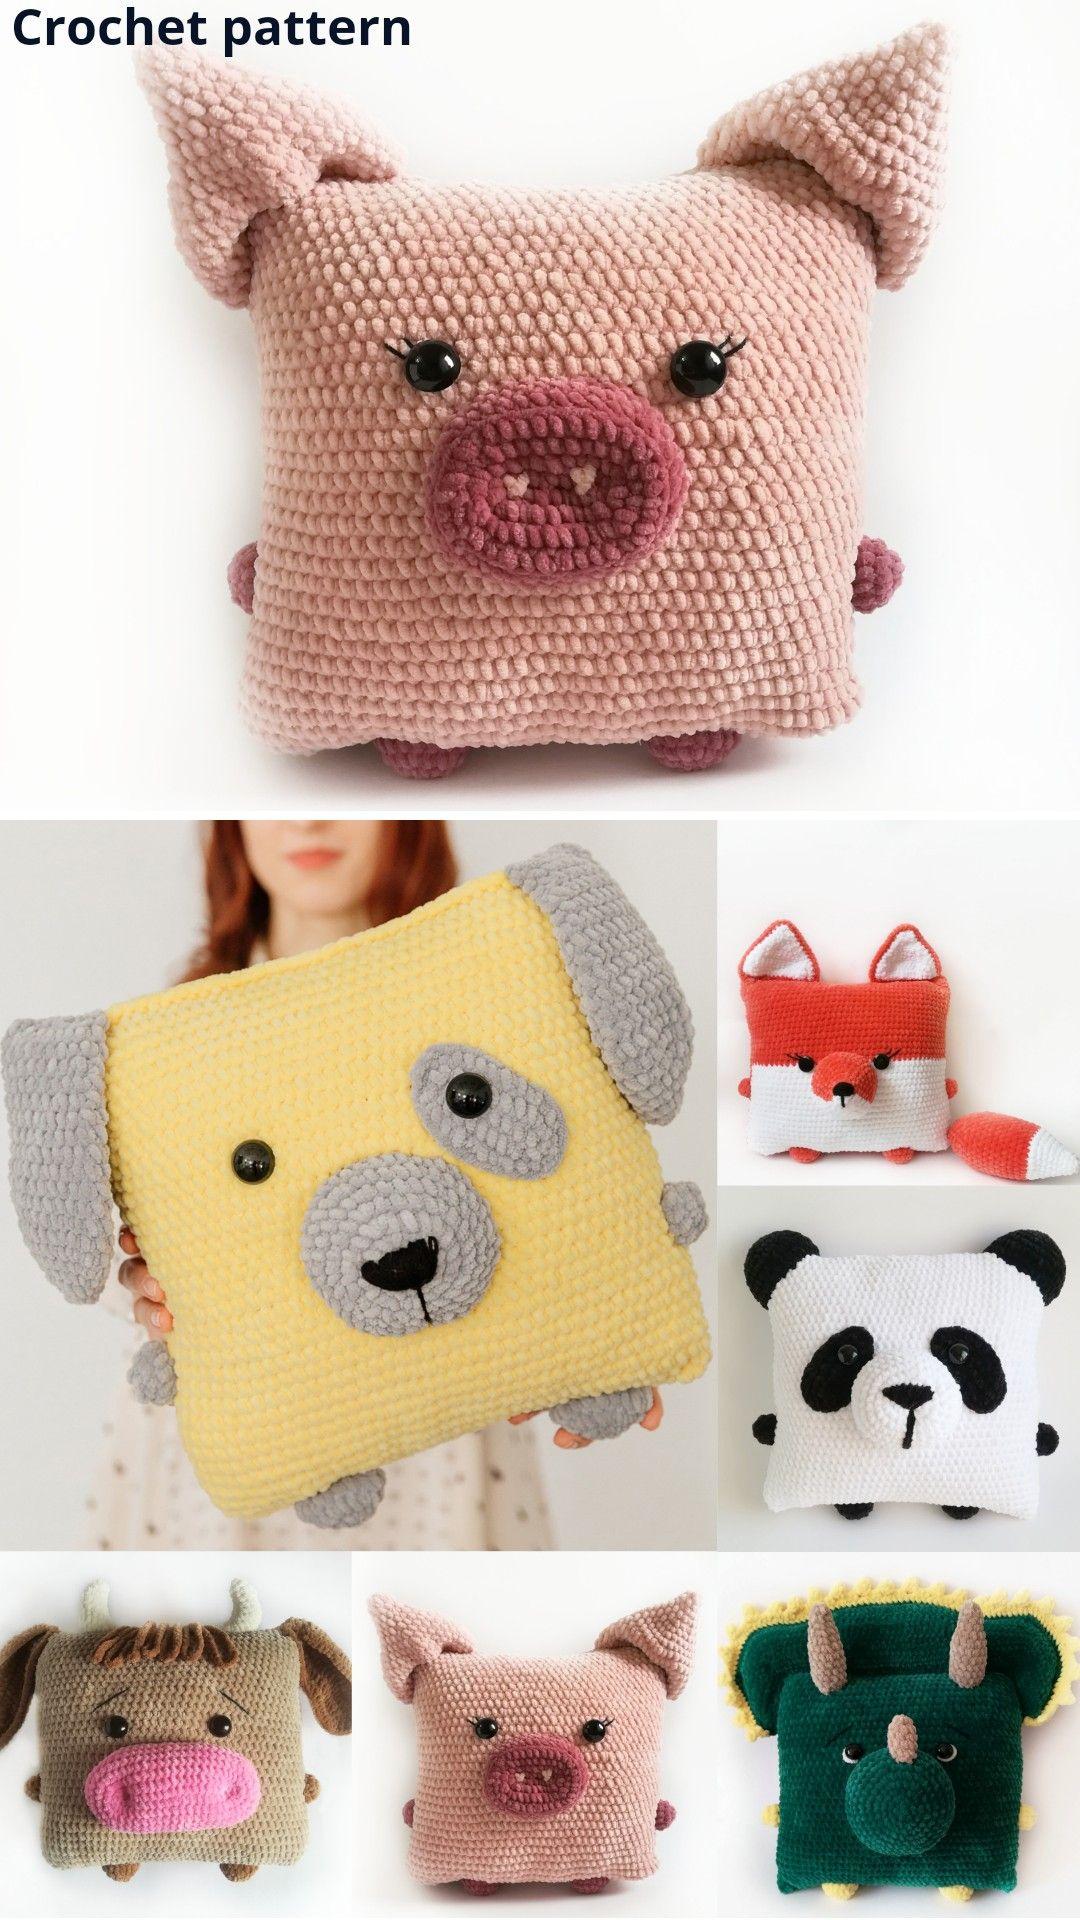 Crochet pattern animal, crochet pillow, crochet toy, amigurumi pattern toy, pet pattern, pillow toys